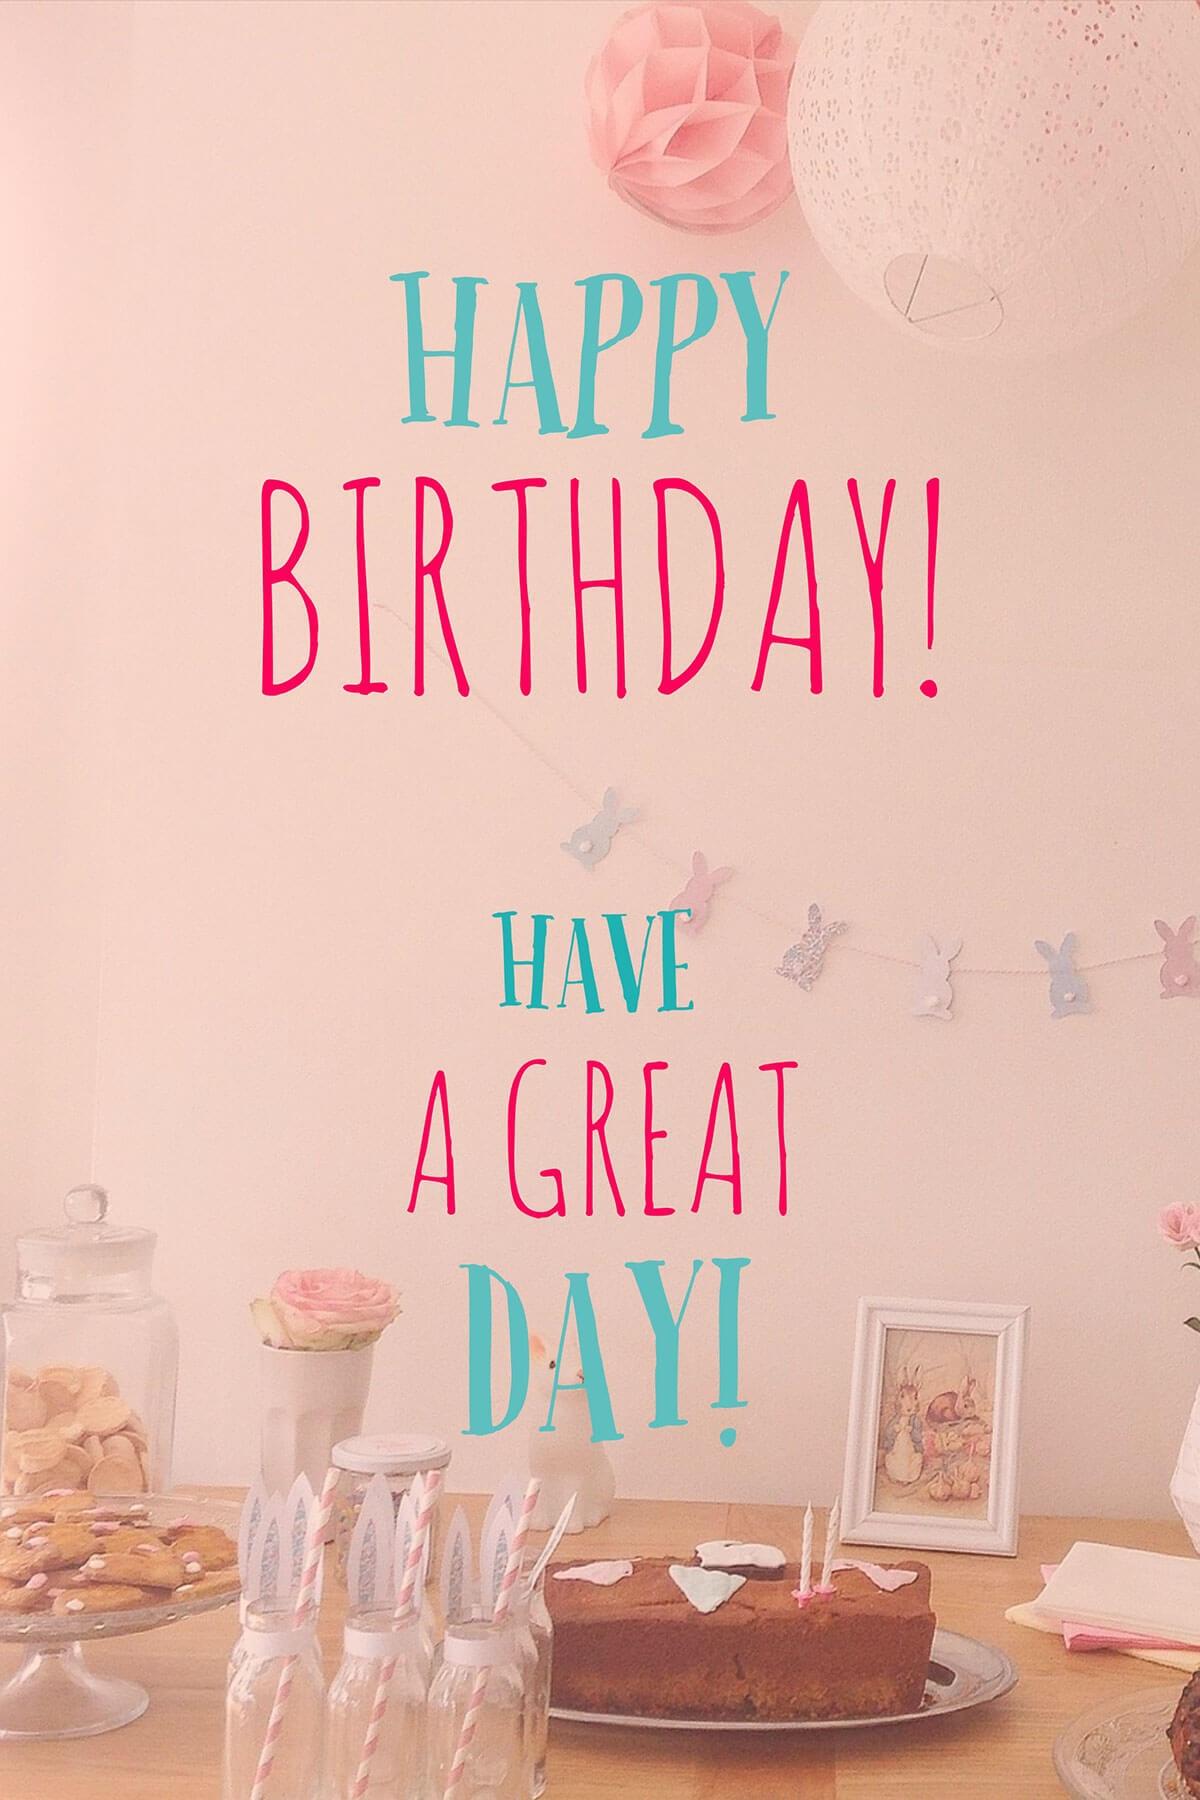 Birthday Card Generator Printable Free - Tutlin.psstech.co - Create Greeting Cards Online Free Printable